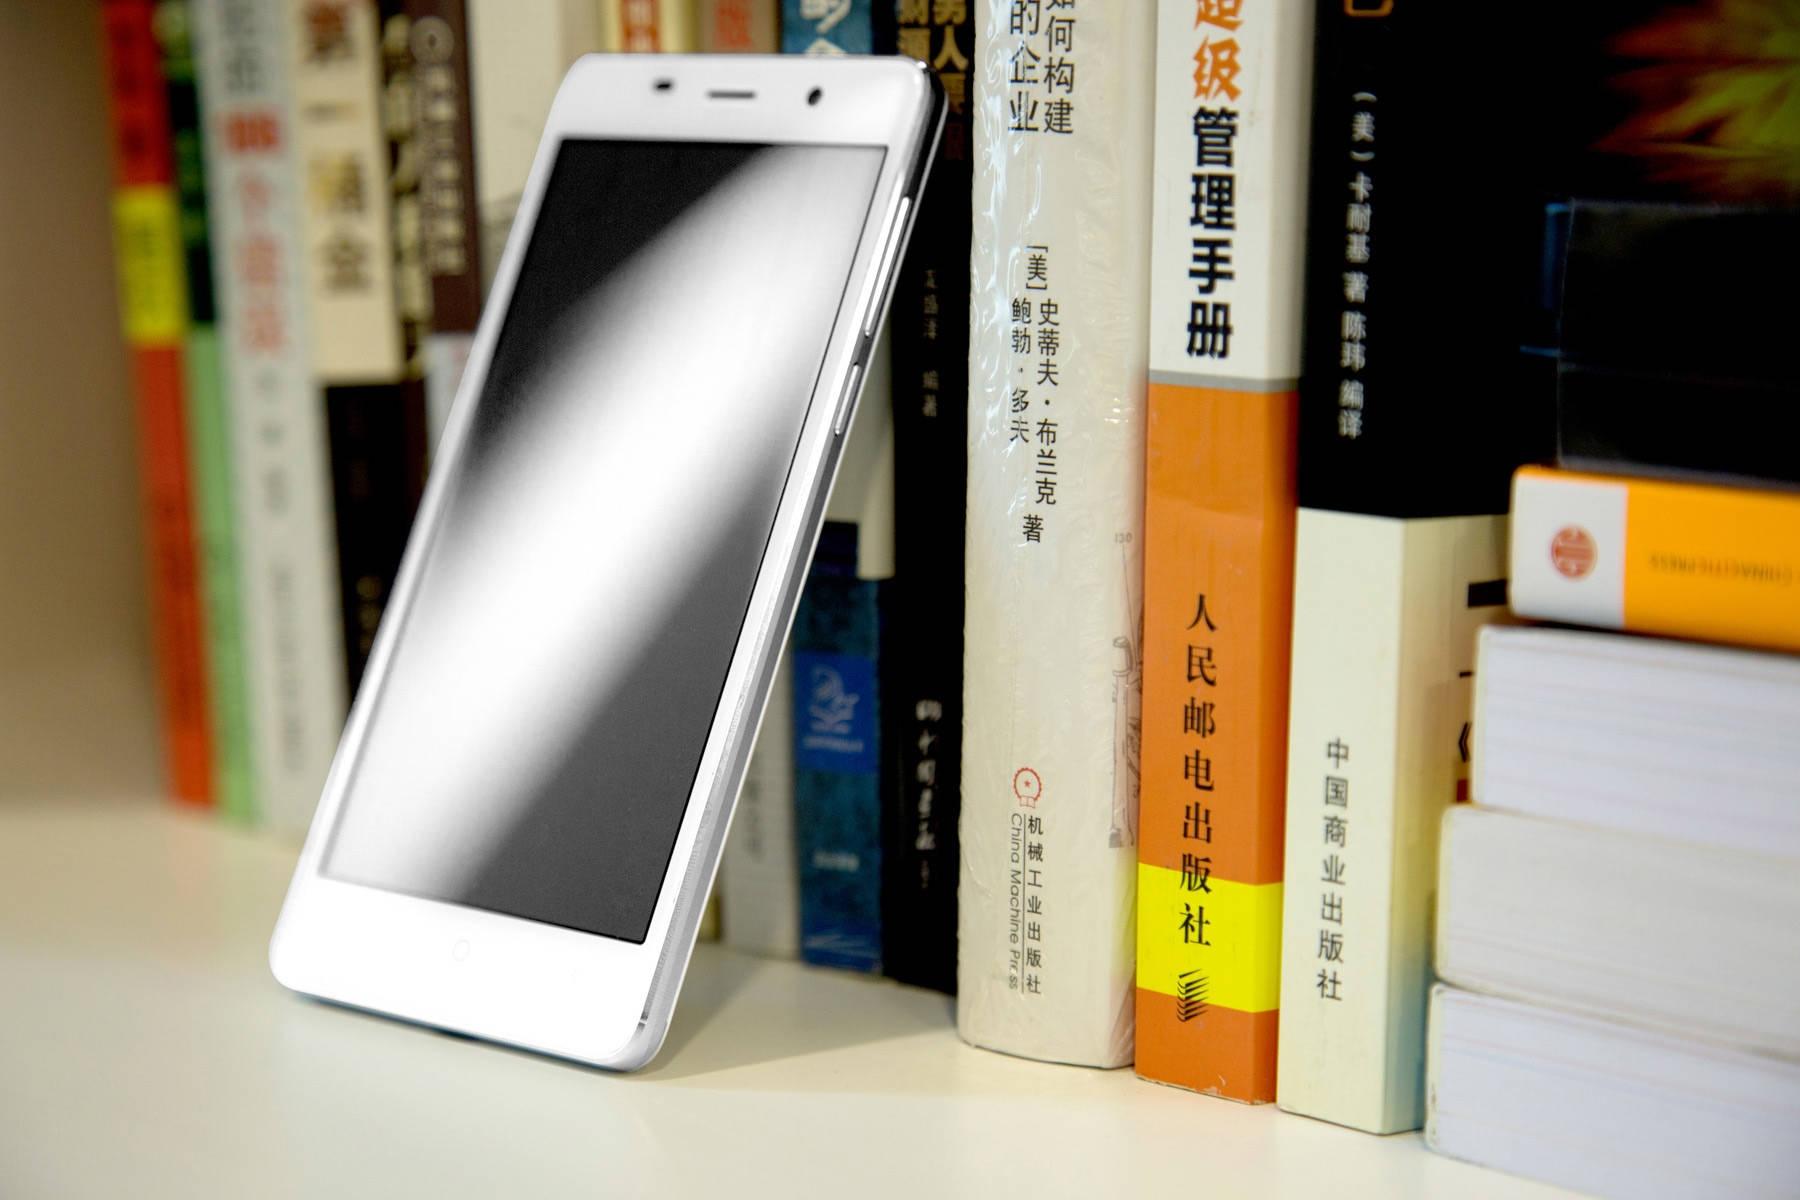 Leagoo M5 Android 6.0 2.5D Arc 5.0 inch Corning Gorilla Glass 4 Screen 3G Smartphone MTK6580 1.3GHz Quad Core 2GB RAM 16GB ROM Finggerprint Scanner GPS Bluetooth 4.0